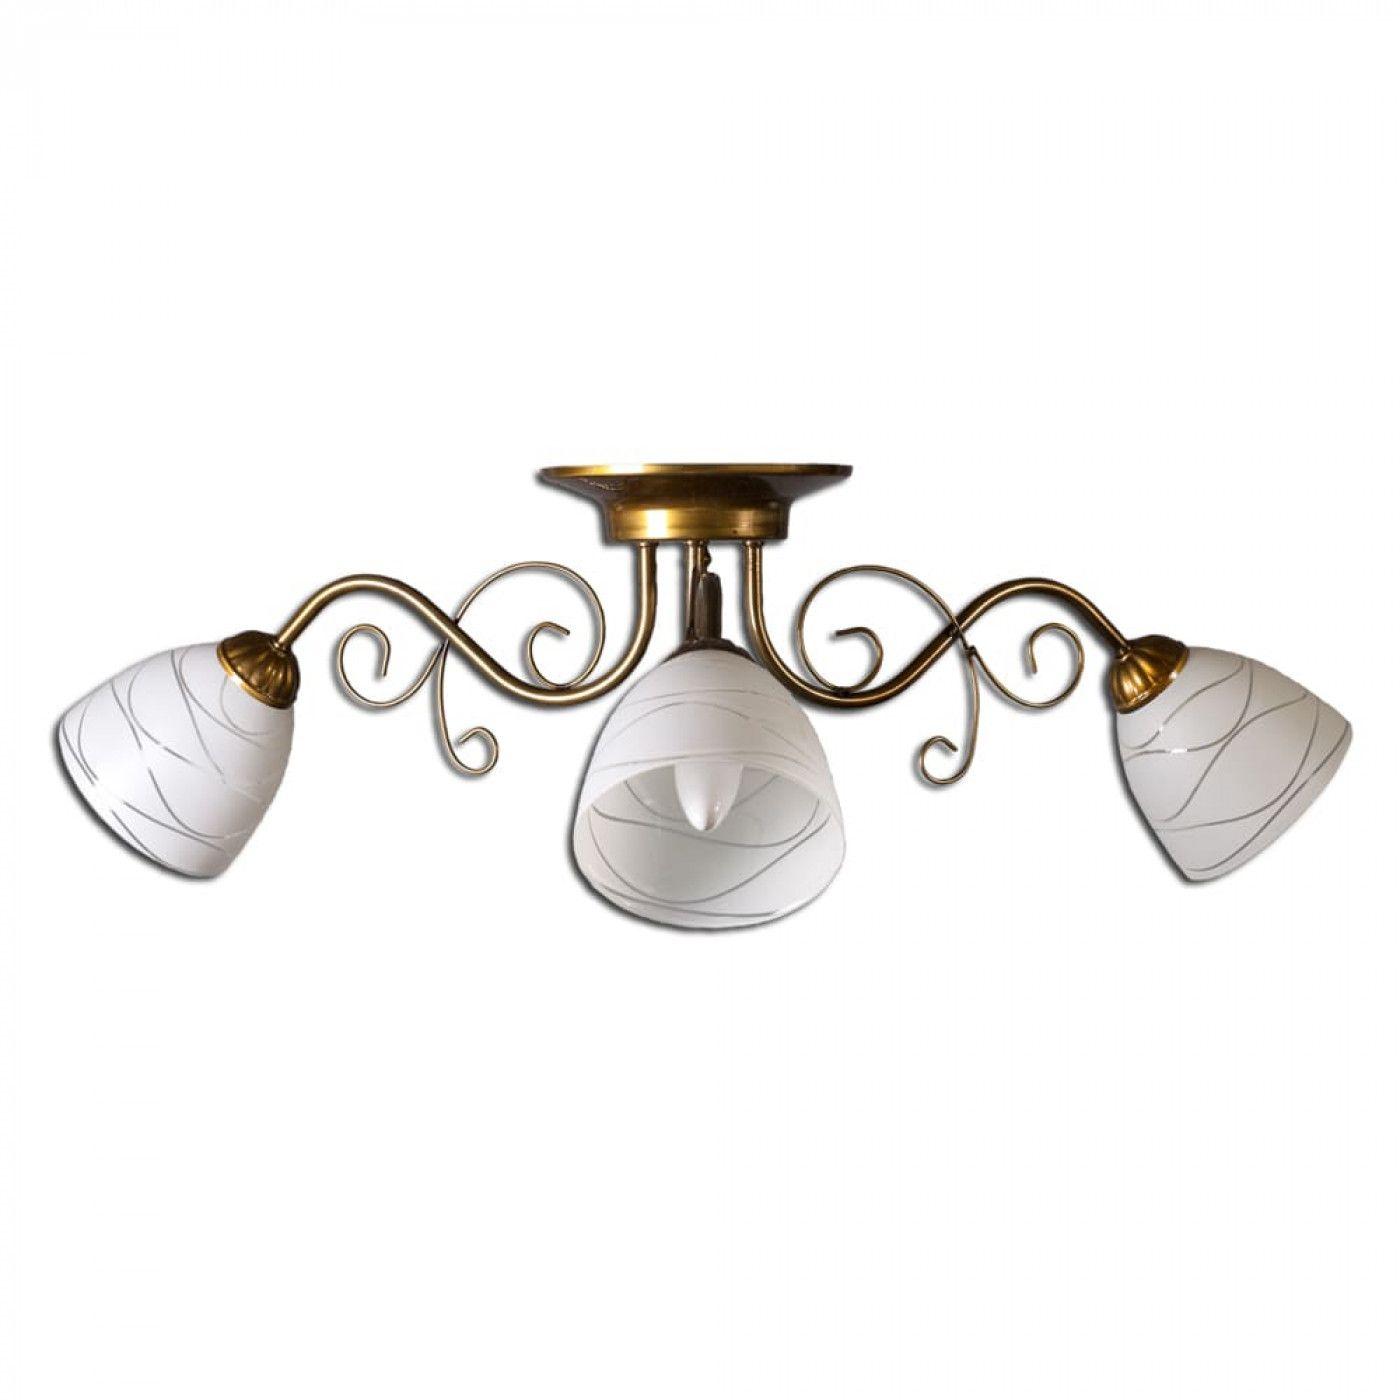 PETRASVET / Ceiling chandelier S2187-3, 3xE27 max. 60W